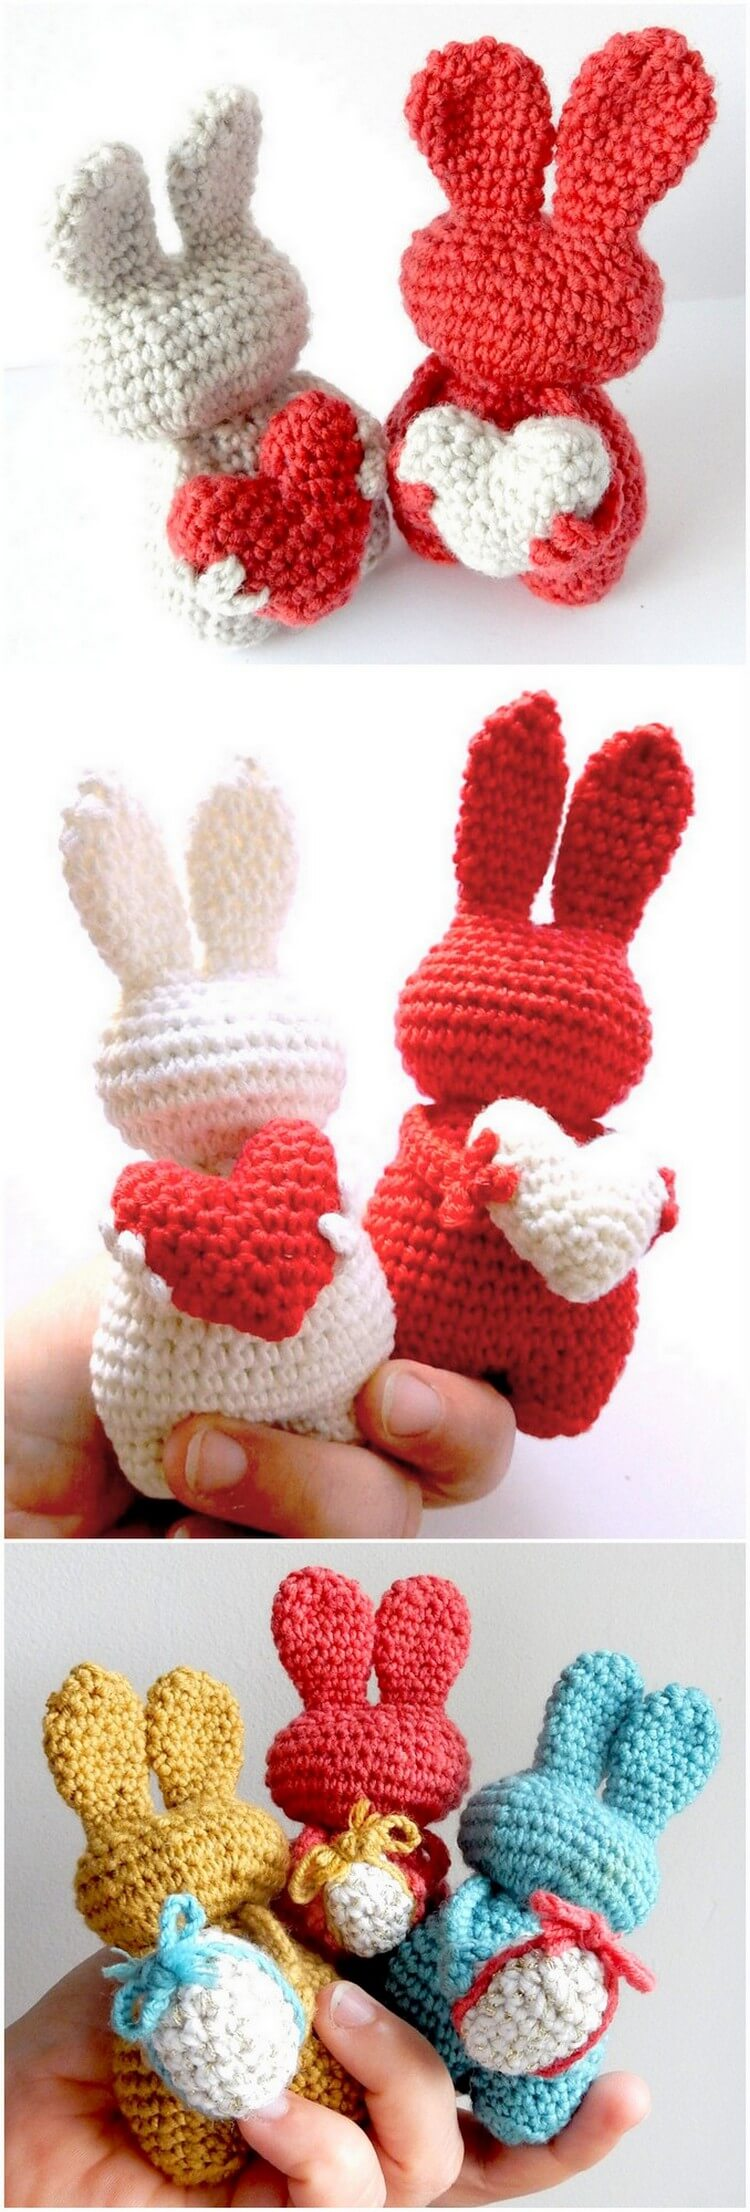 Crochet Amigurumi Pattern (101)